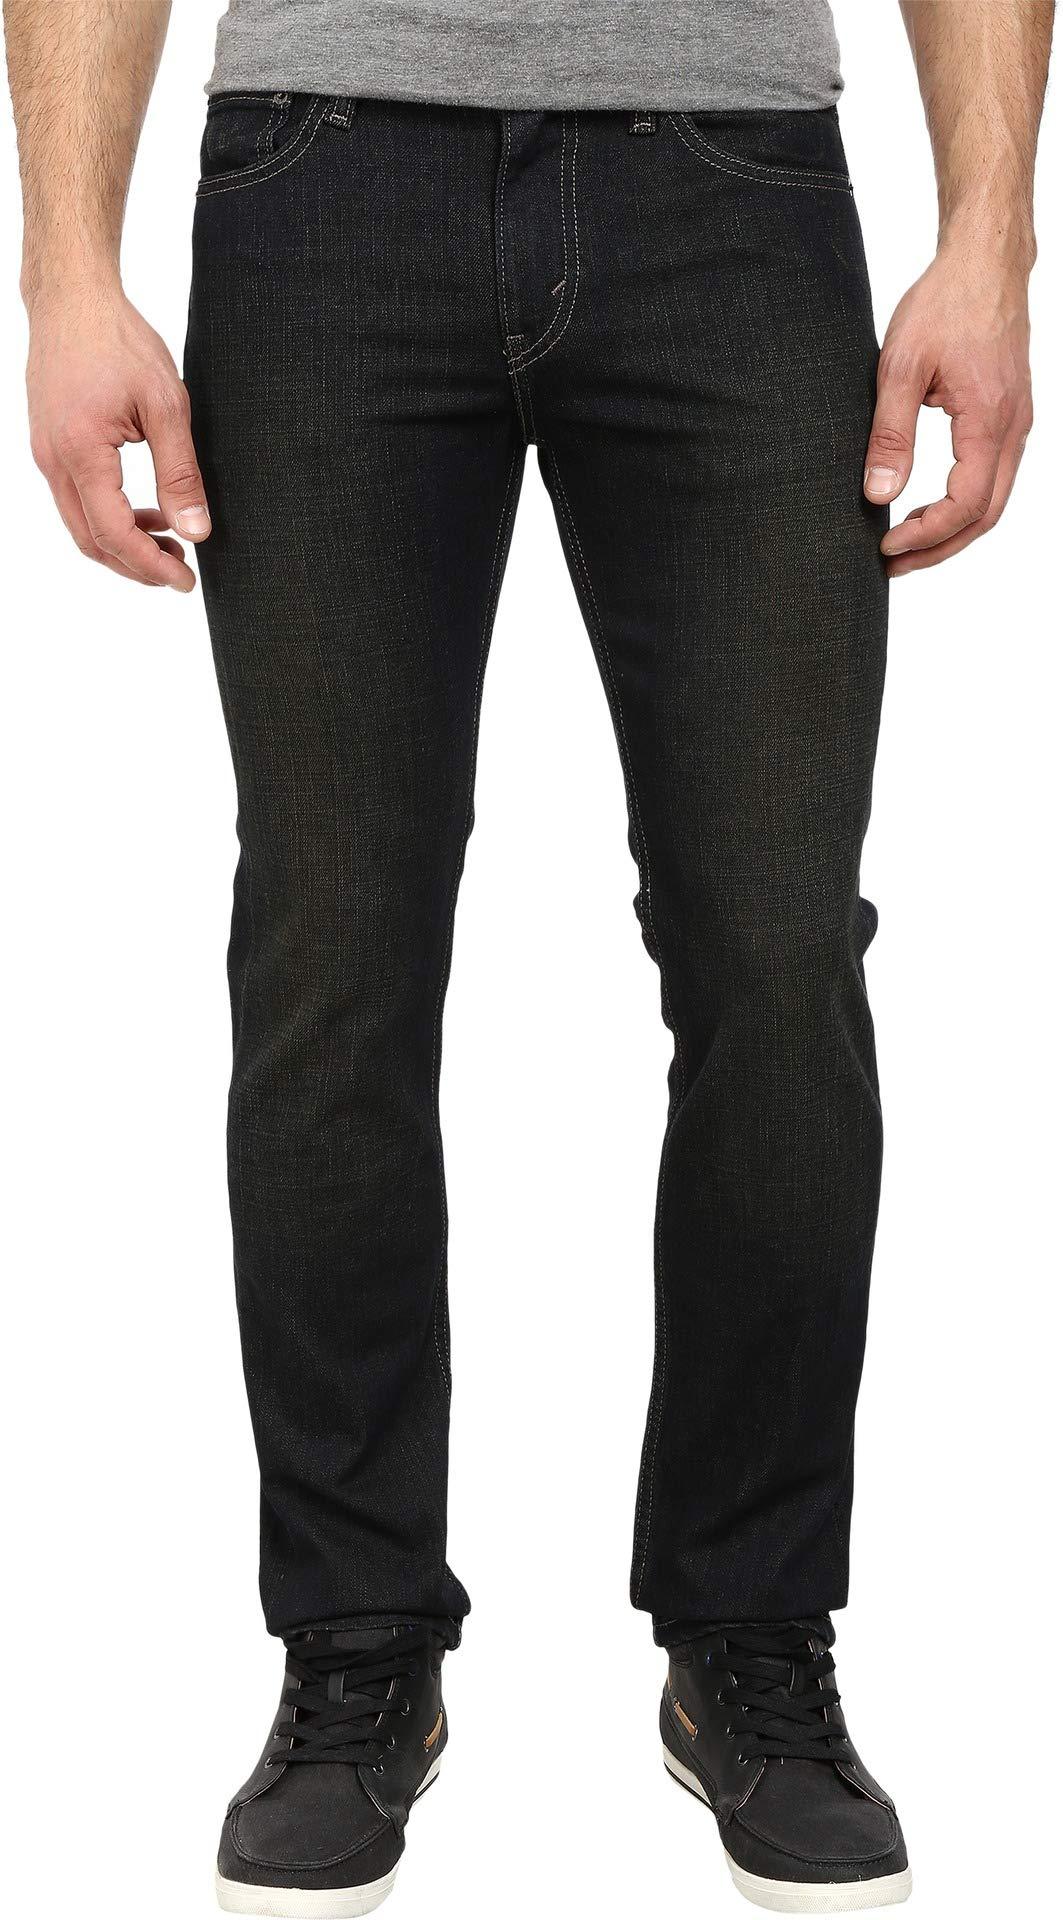 Levi's Men's 511 Slim Fit Jean, Clean Dark - Stretch, 36W x 32L